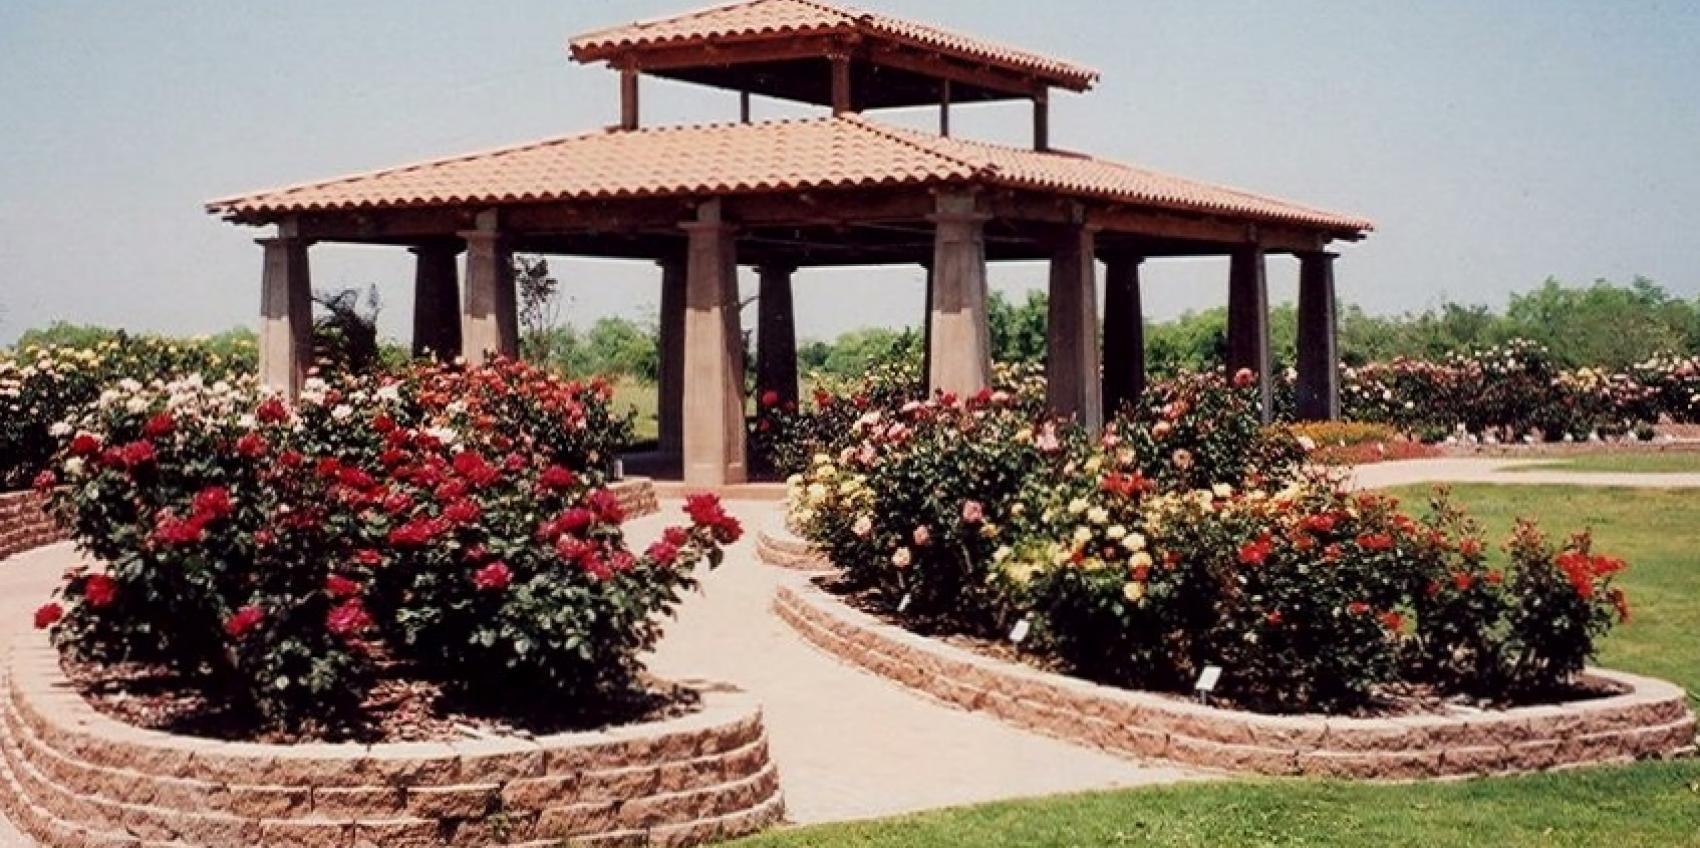 South Texas Botanical Gardens Nature Center American Public Gardens Association